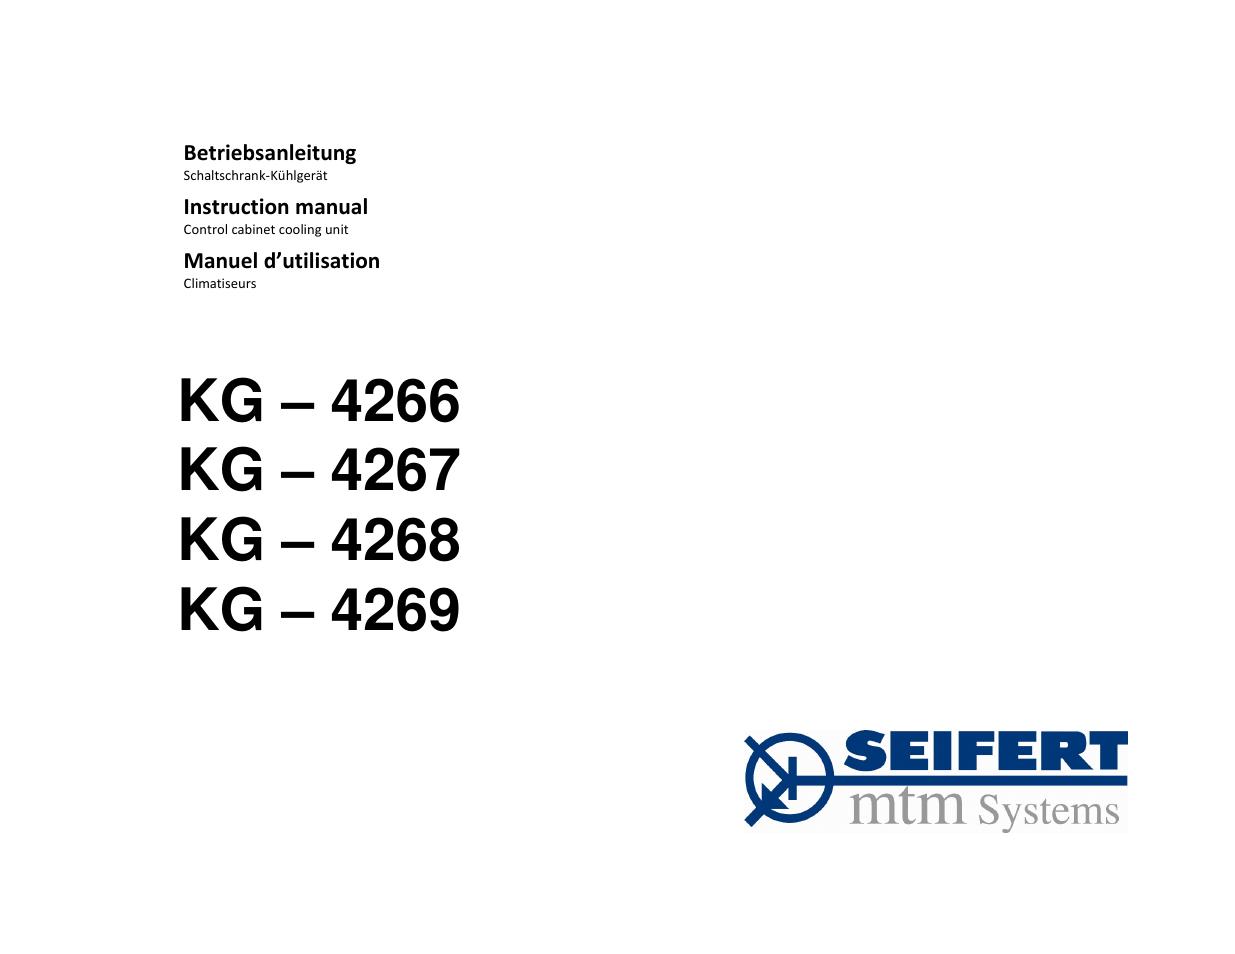 SEIFERT Filterless Control Cabinet Air Conditioner KG 4269